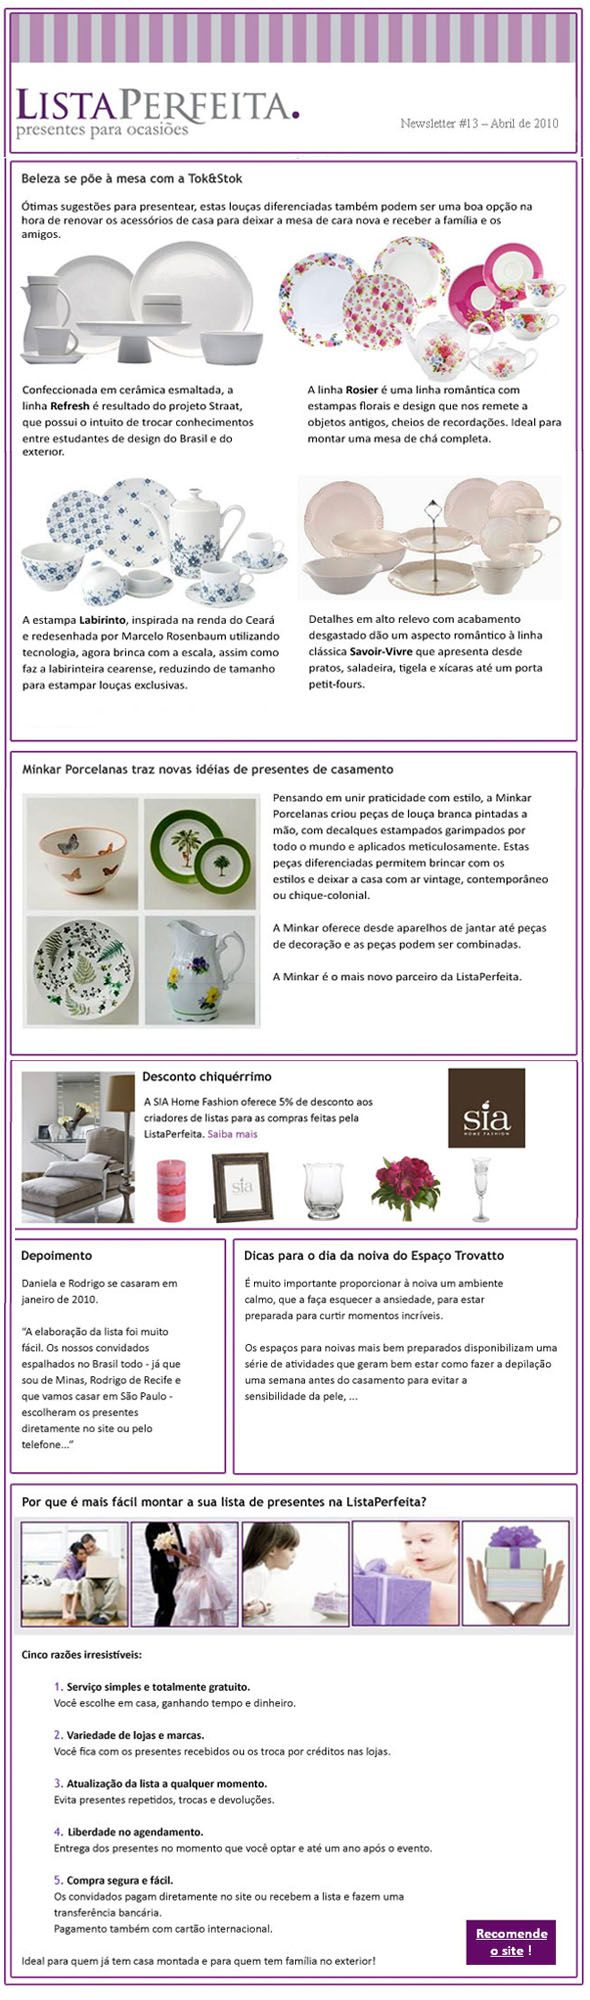 Casamenteirasarquivos Blog P Gina 311 De 340 Casamenteiras